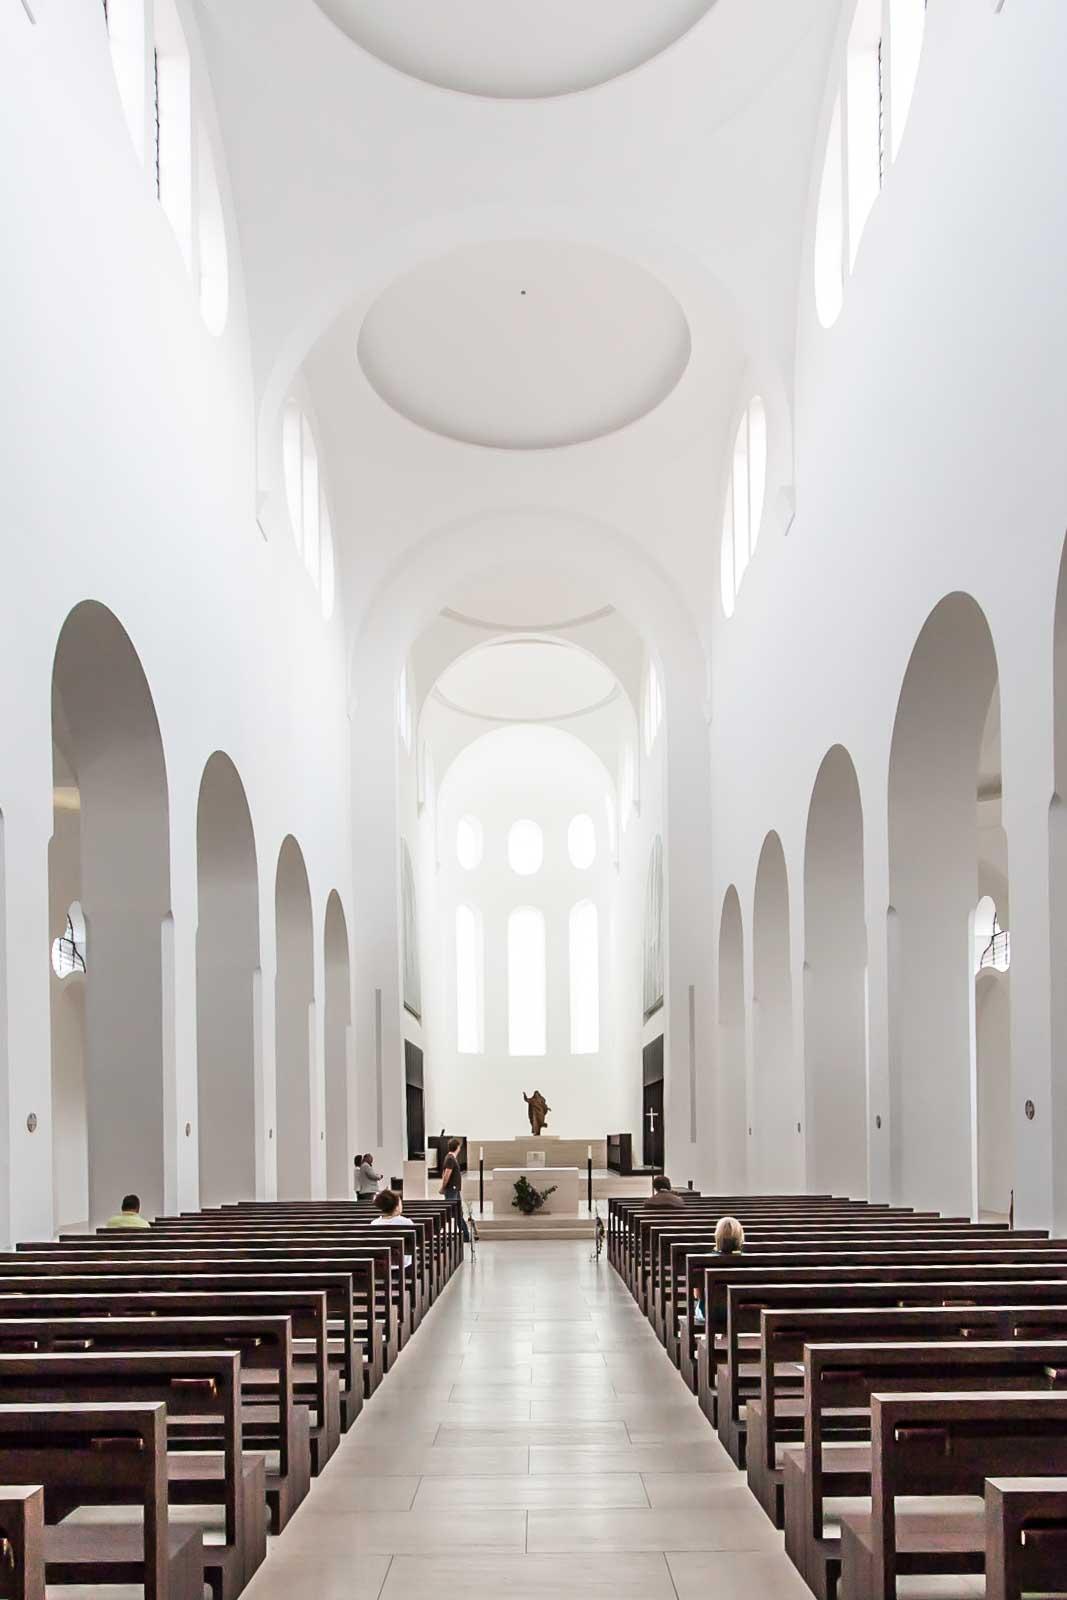 Moritzkirche-Augsburg-Andreas-Fuhrmann-0002